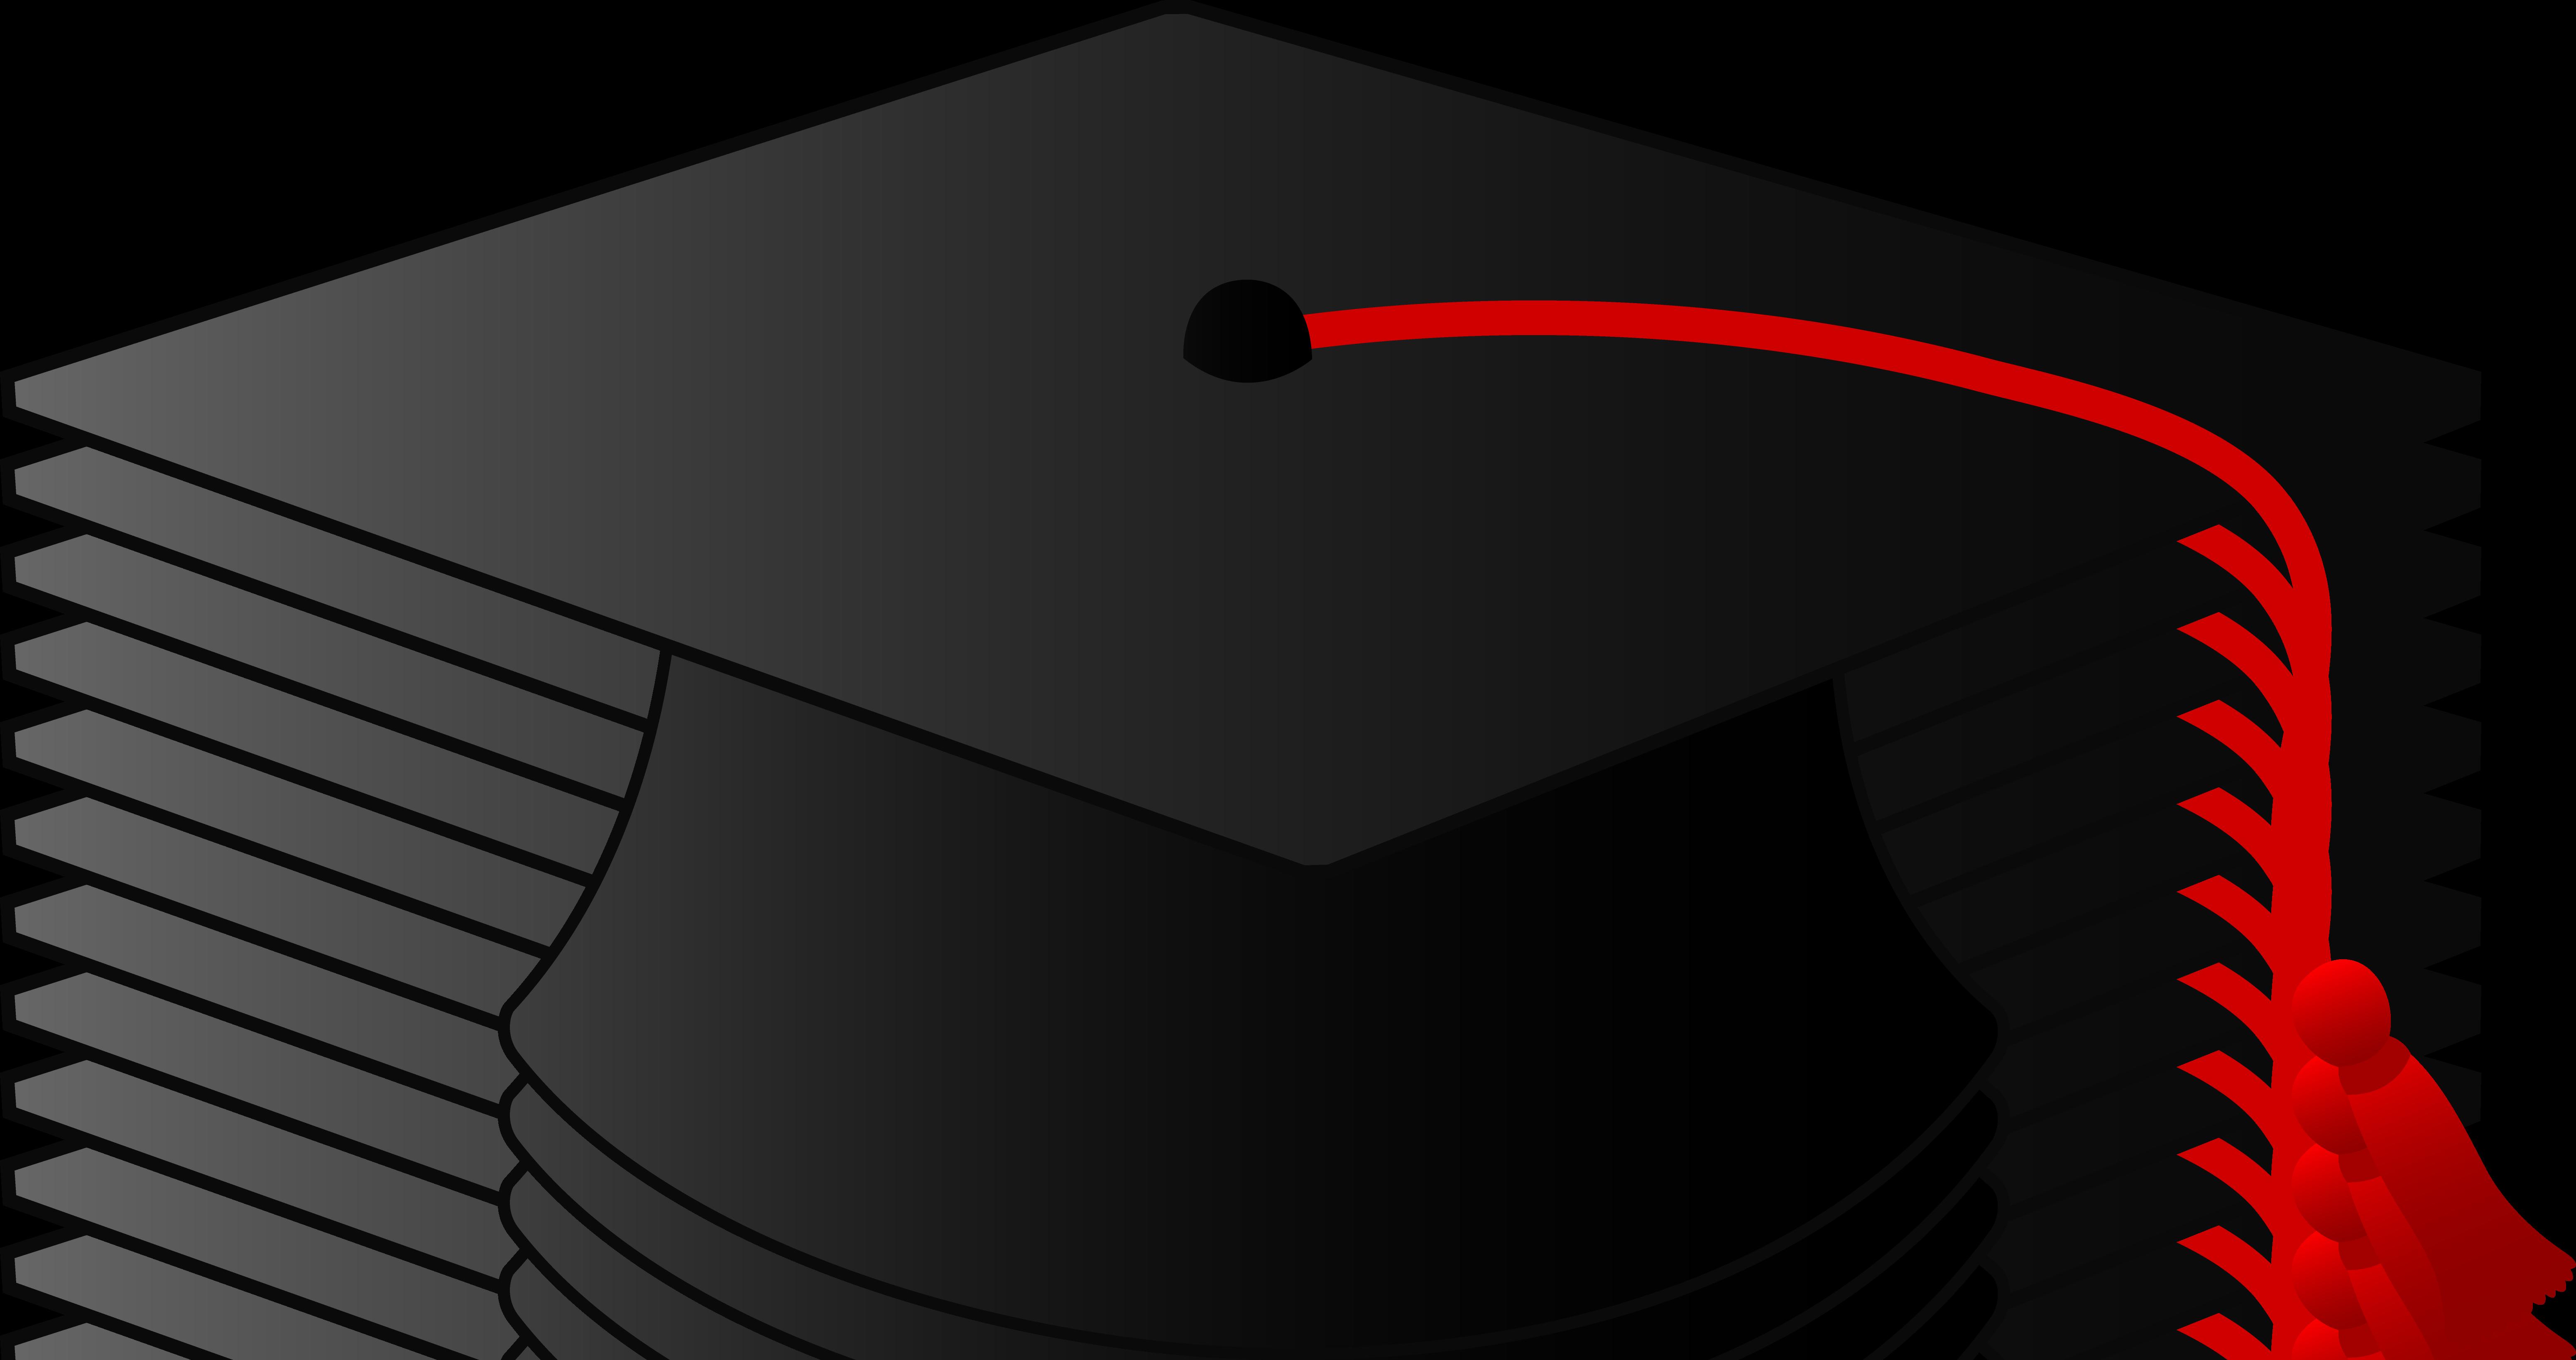 6204x3275 Image Of Graduation Clipart 3 Graduation Clip Art Free 2